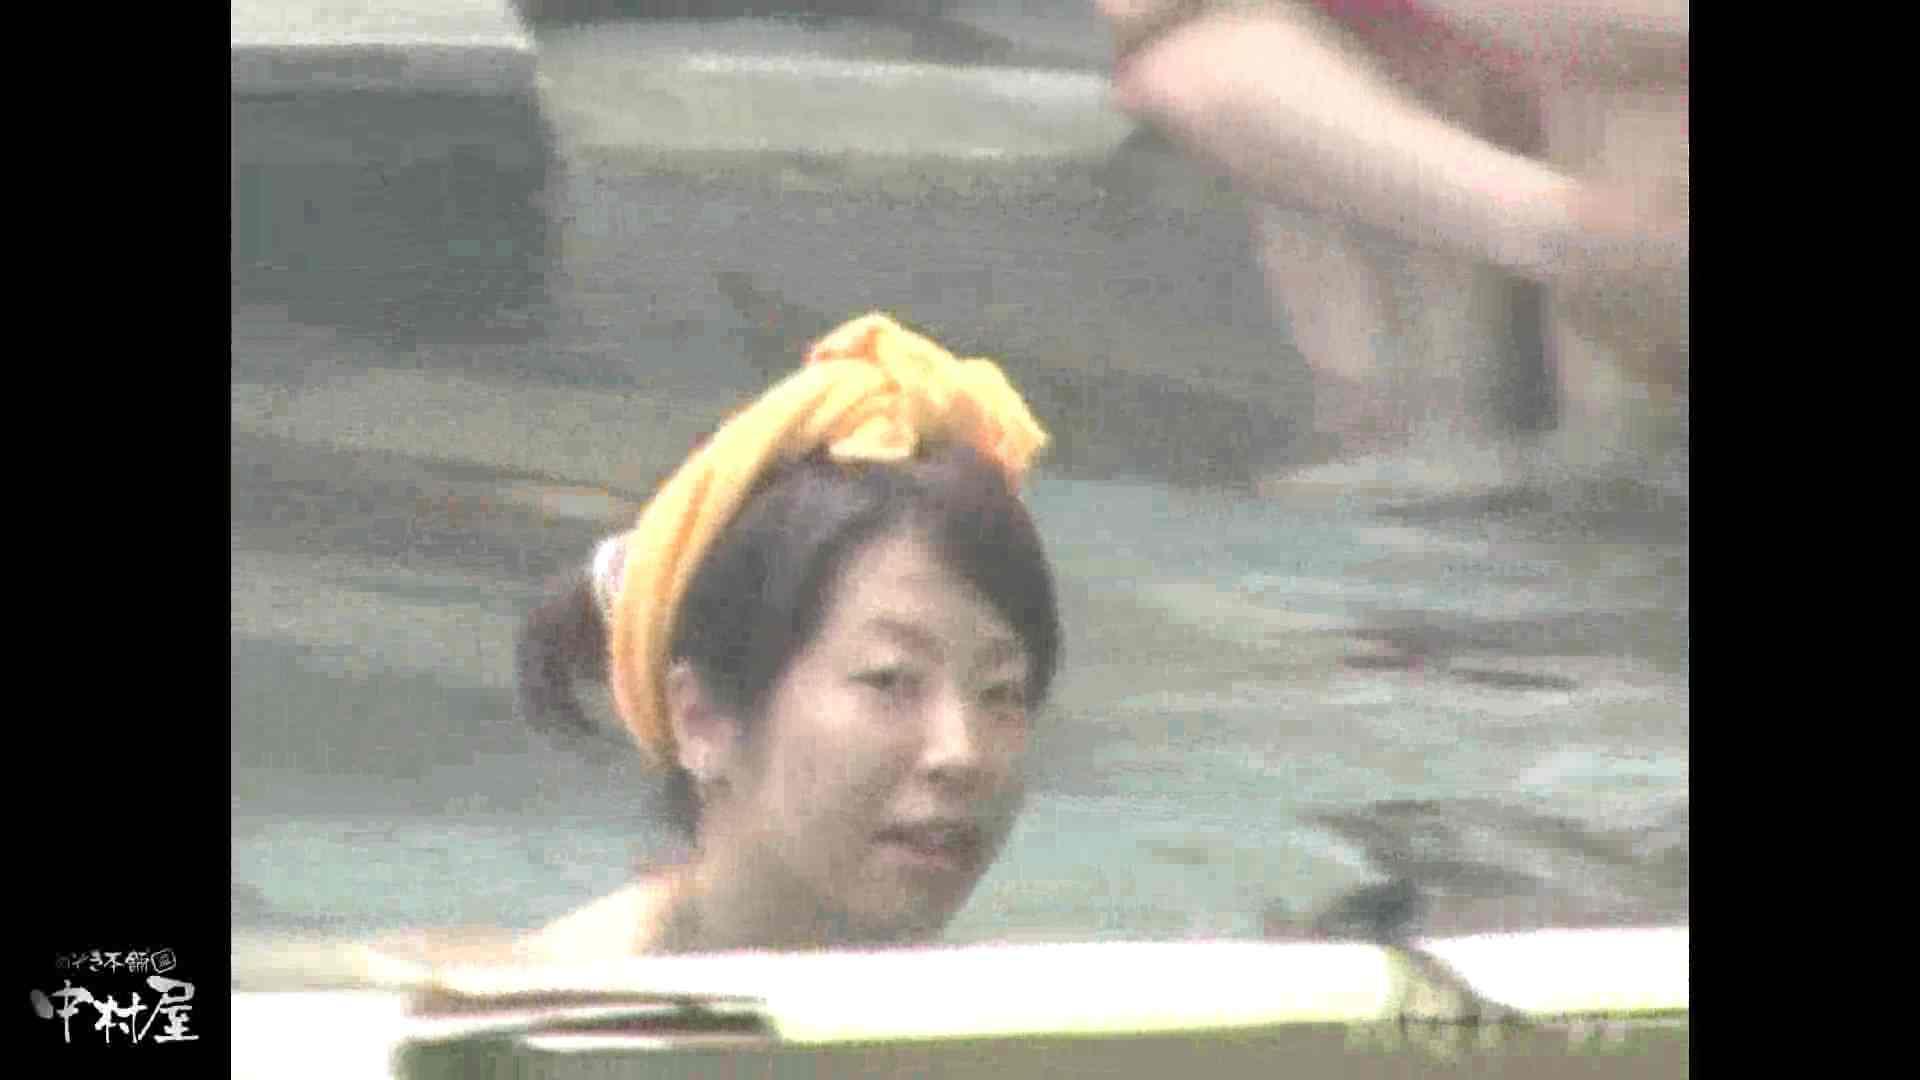 Aquaな露天風呂Vol.881潜入盗撮露天風呂十七判湯 其の五 0  54pic 32